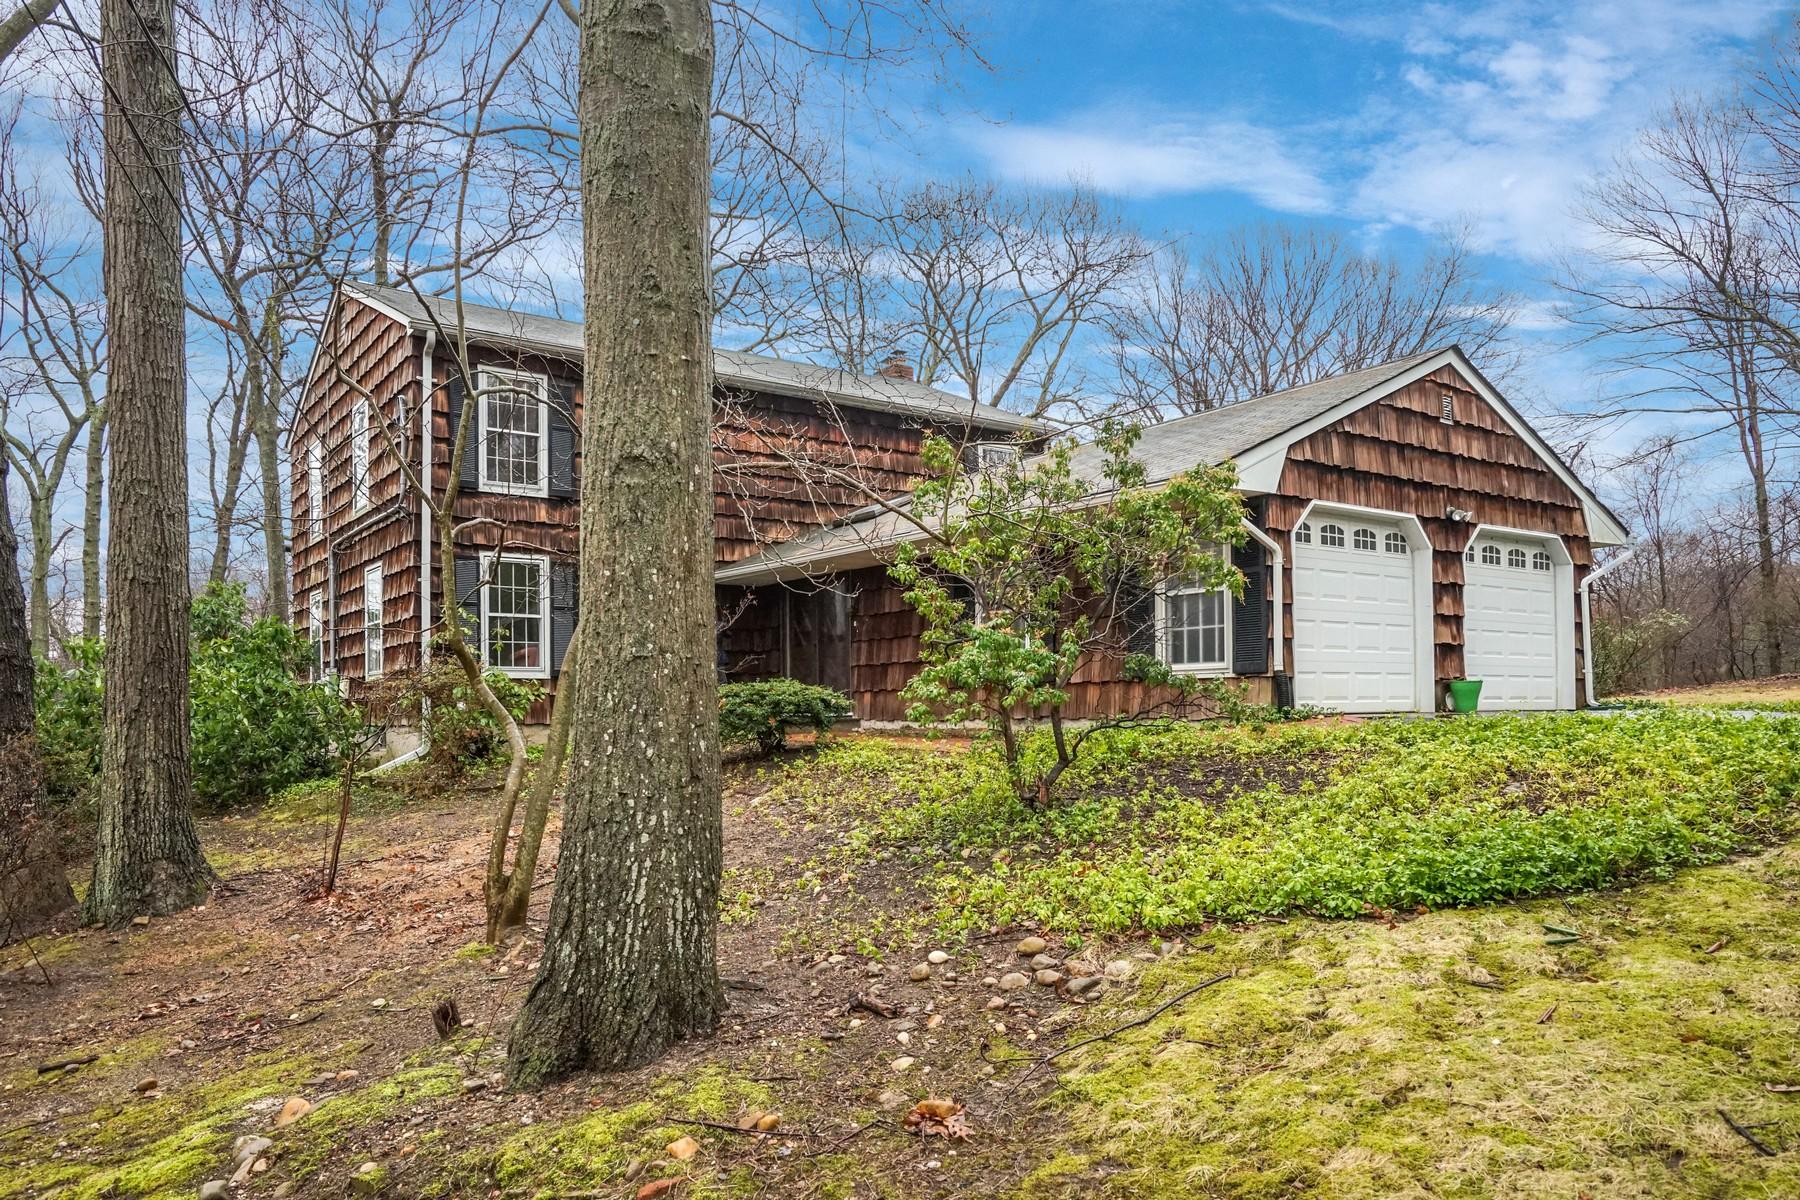 Single Family Homes for Sale at Stony Brook 21 Hawks Nest Road Stony Brook, New York 11790 United States